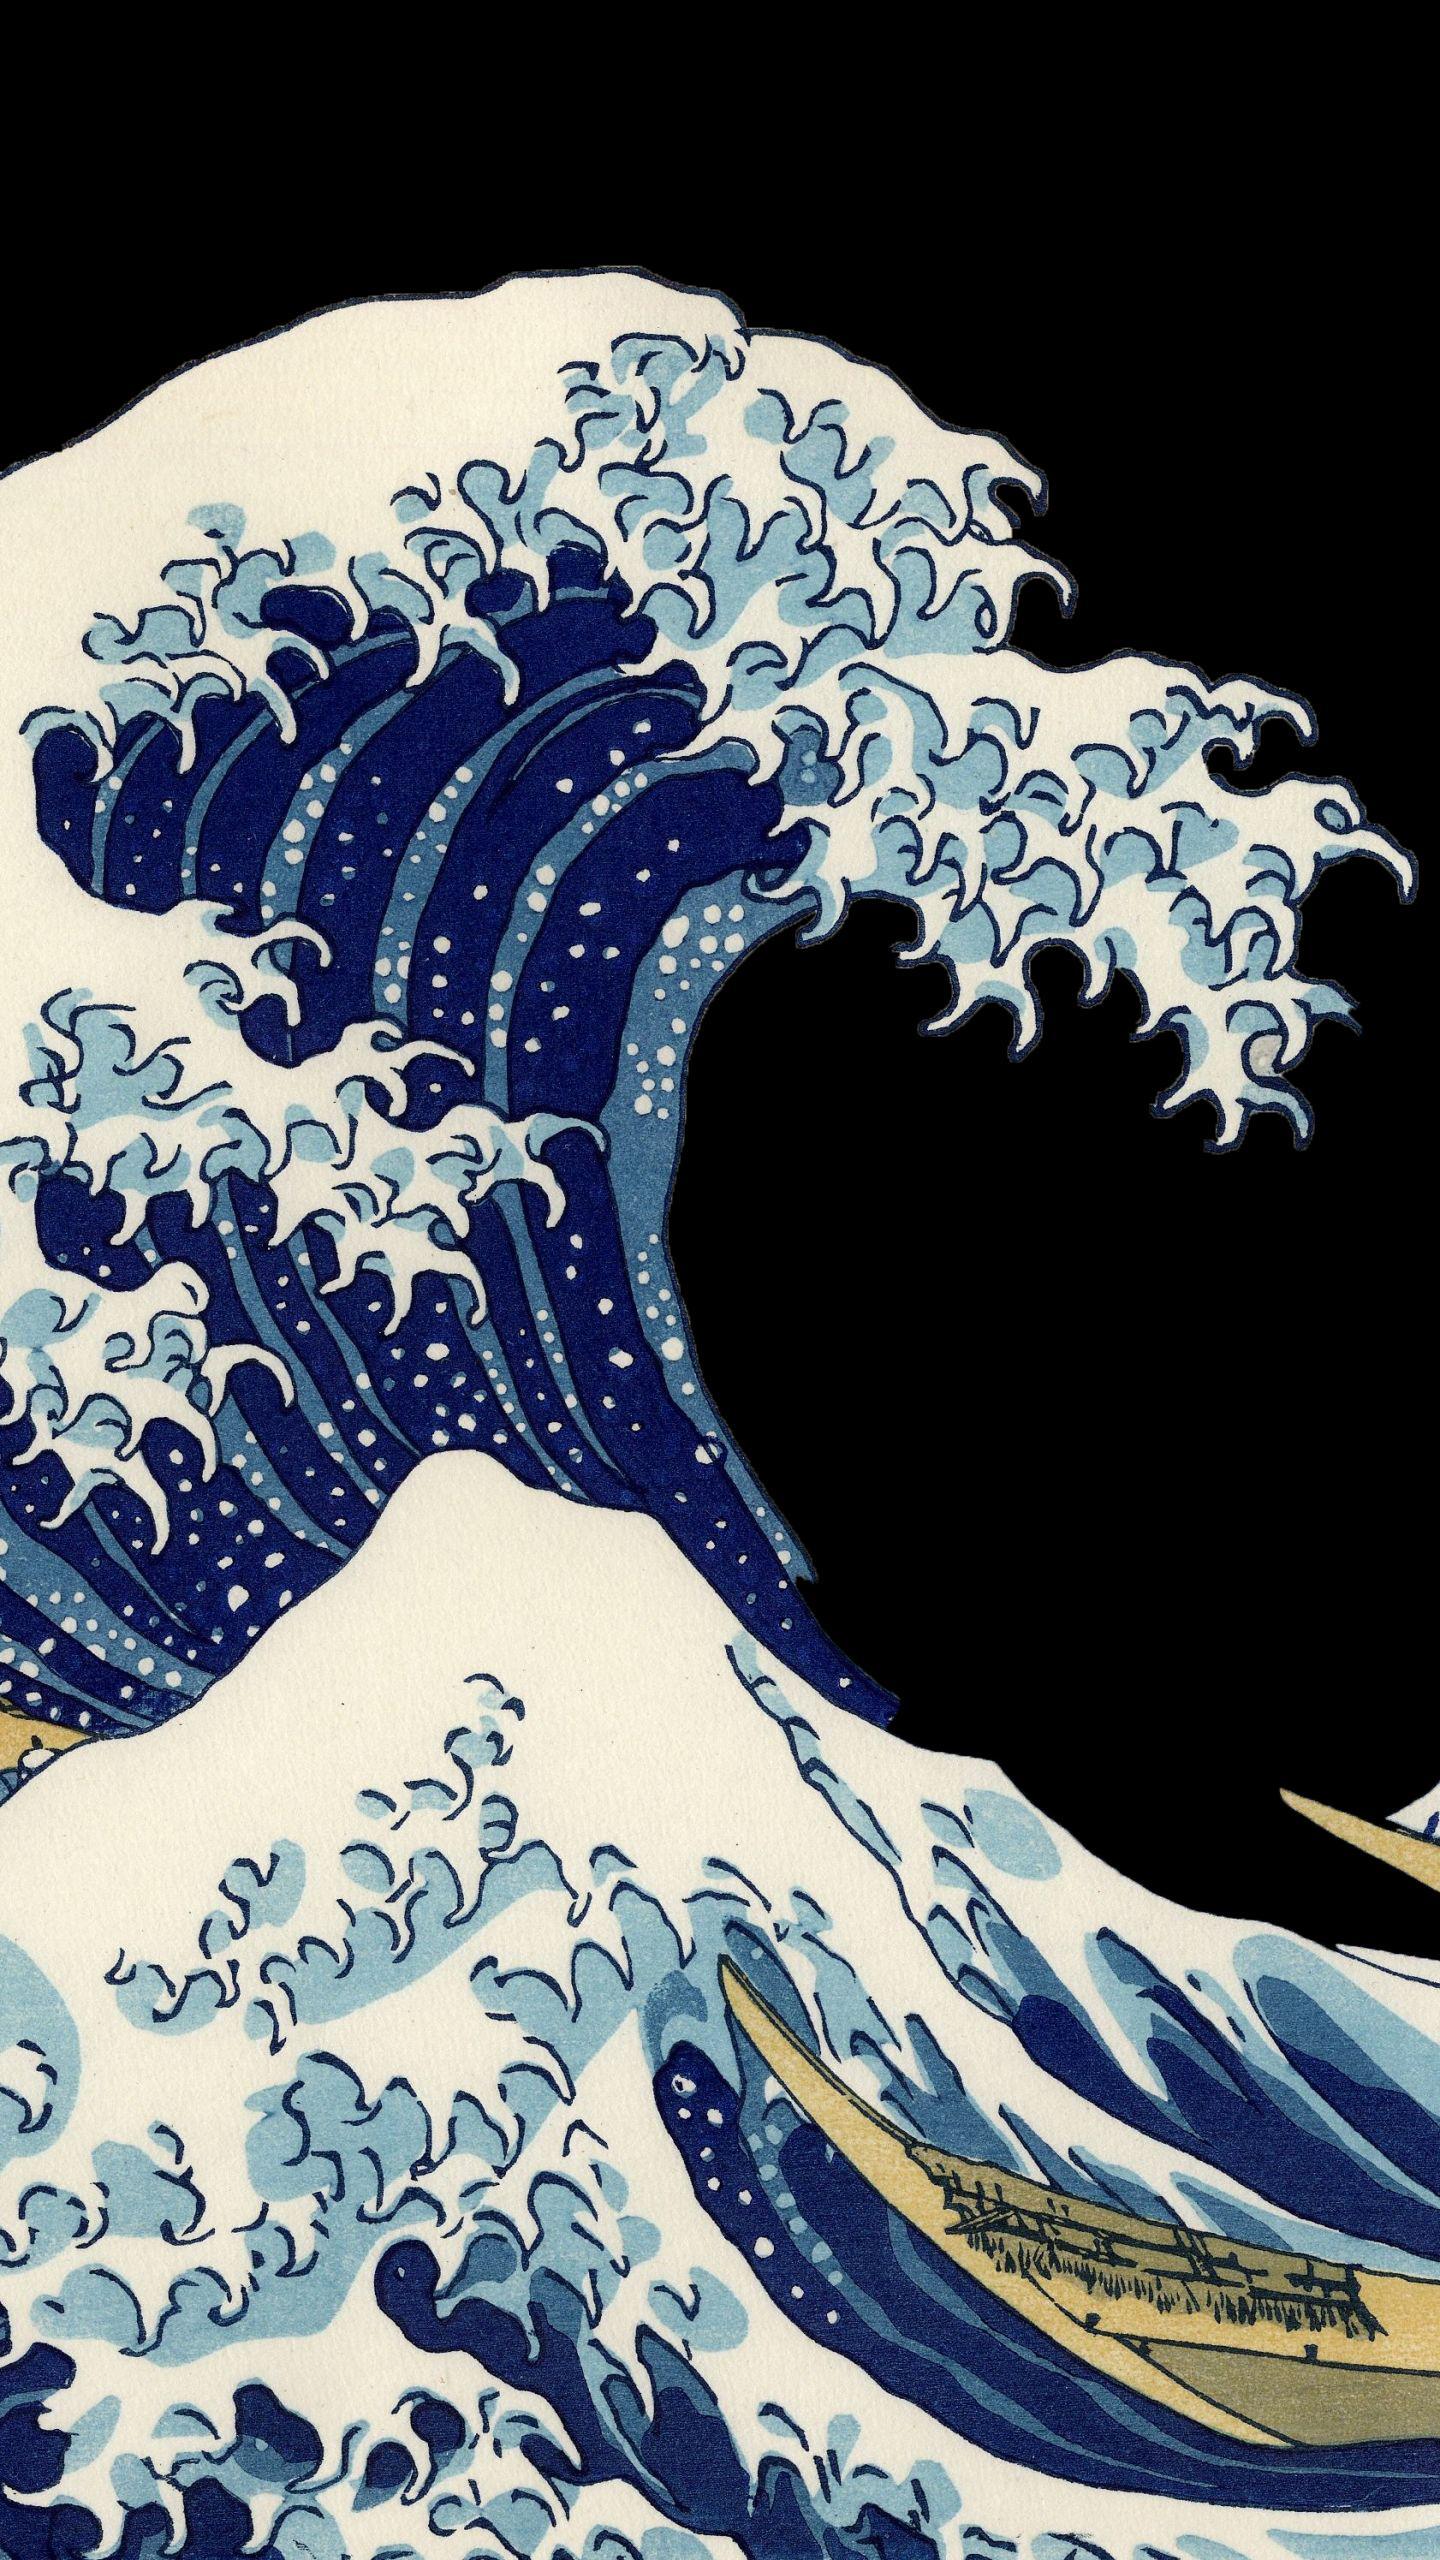 The Great Wave Off Kanagawa Wallpaper Posted By Samantha Thompson